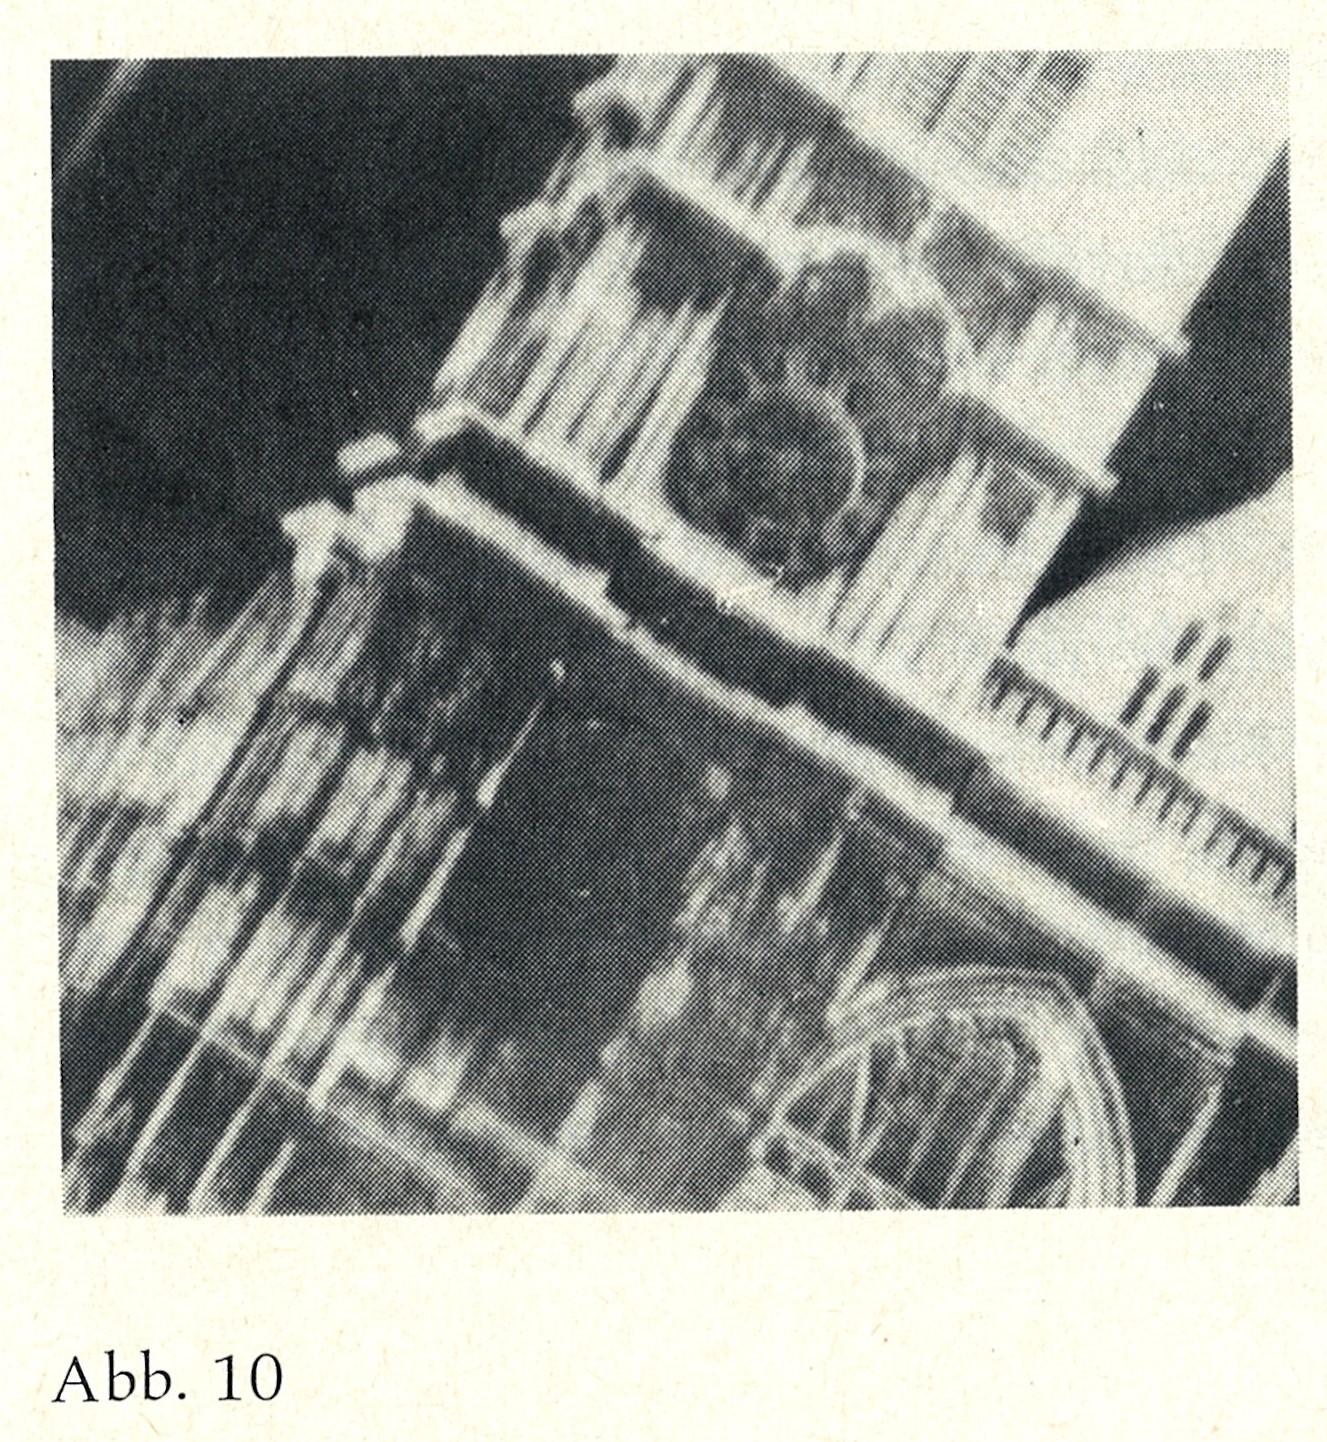 Eisenbud, Dr. Jule (Abb. 10) 17-01-20